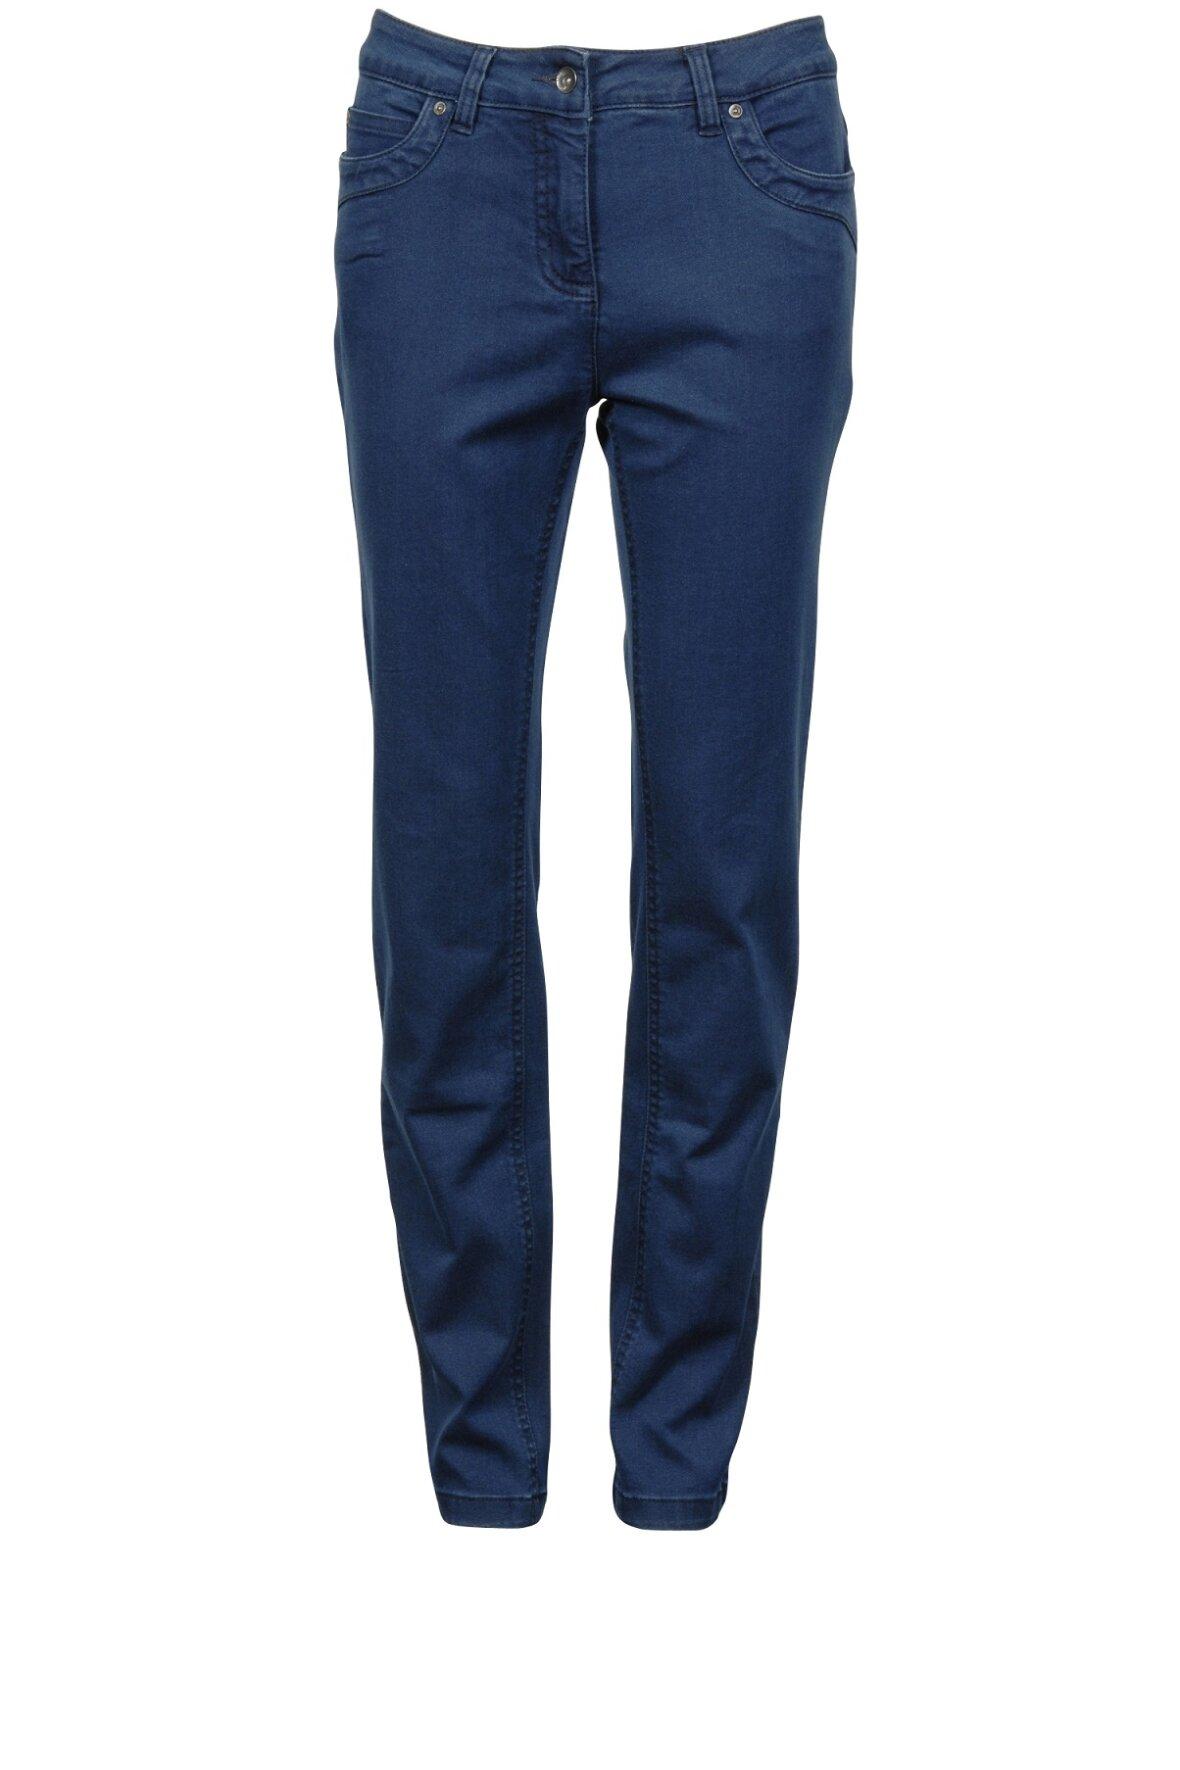 Brandtex Victoria Regular Fit, sort denim jeans